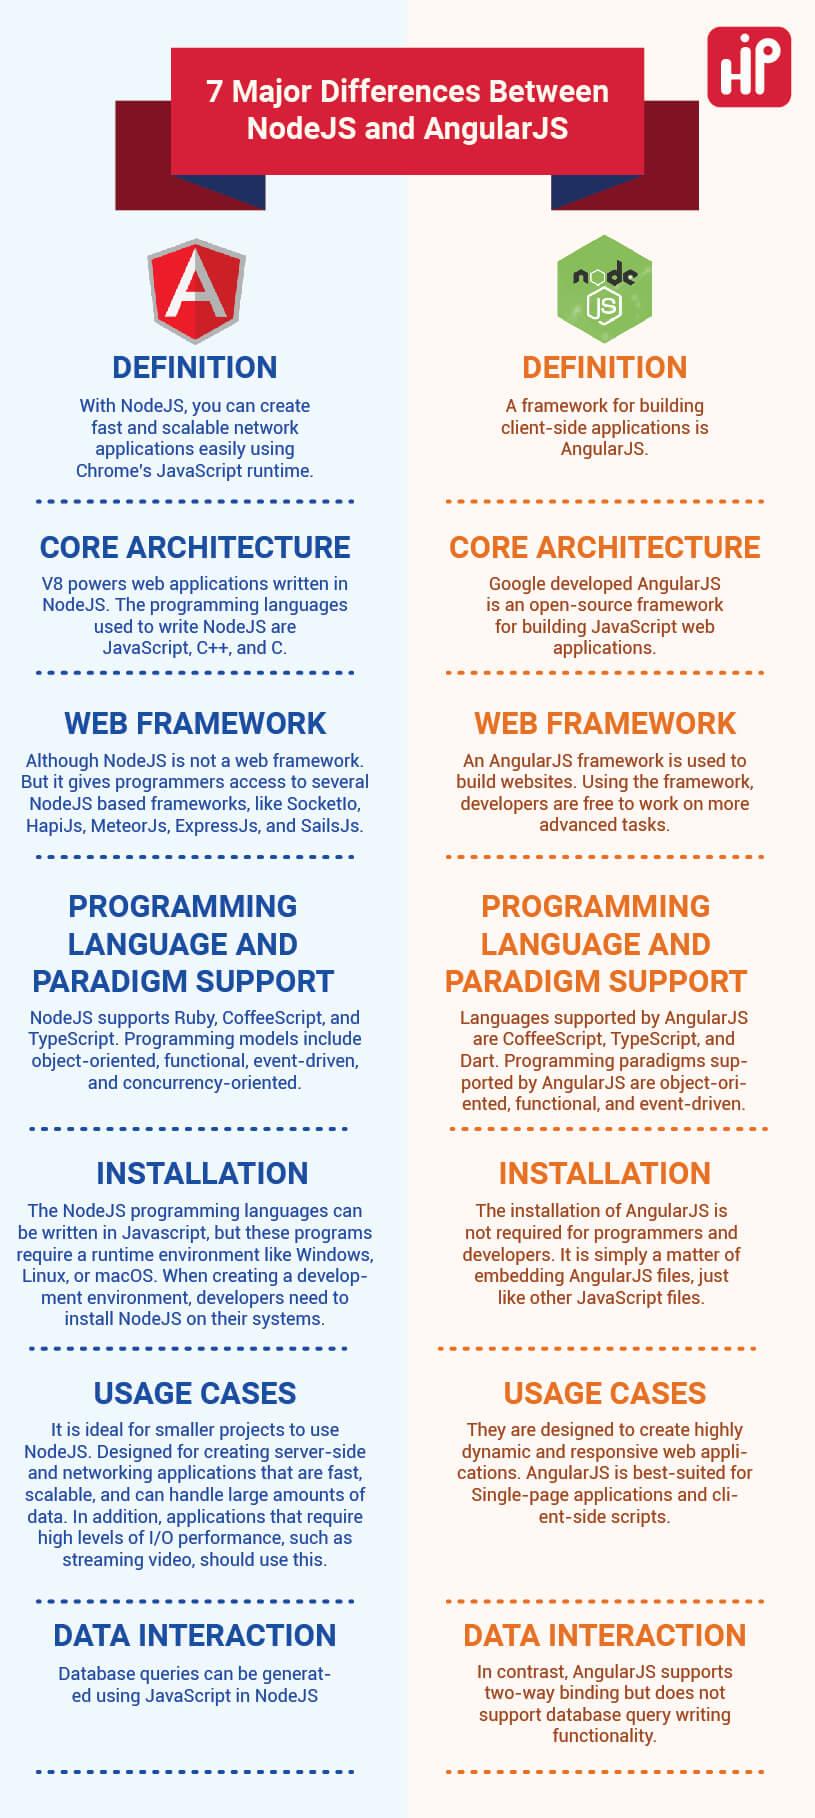 7 Major Differences Between NodeJS and AngularJS